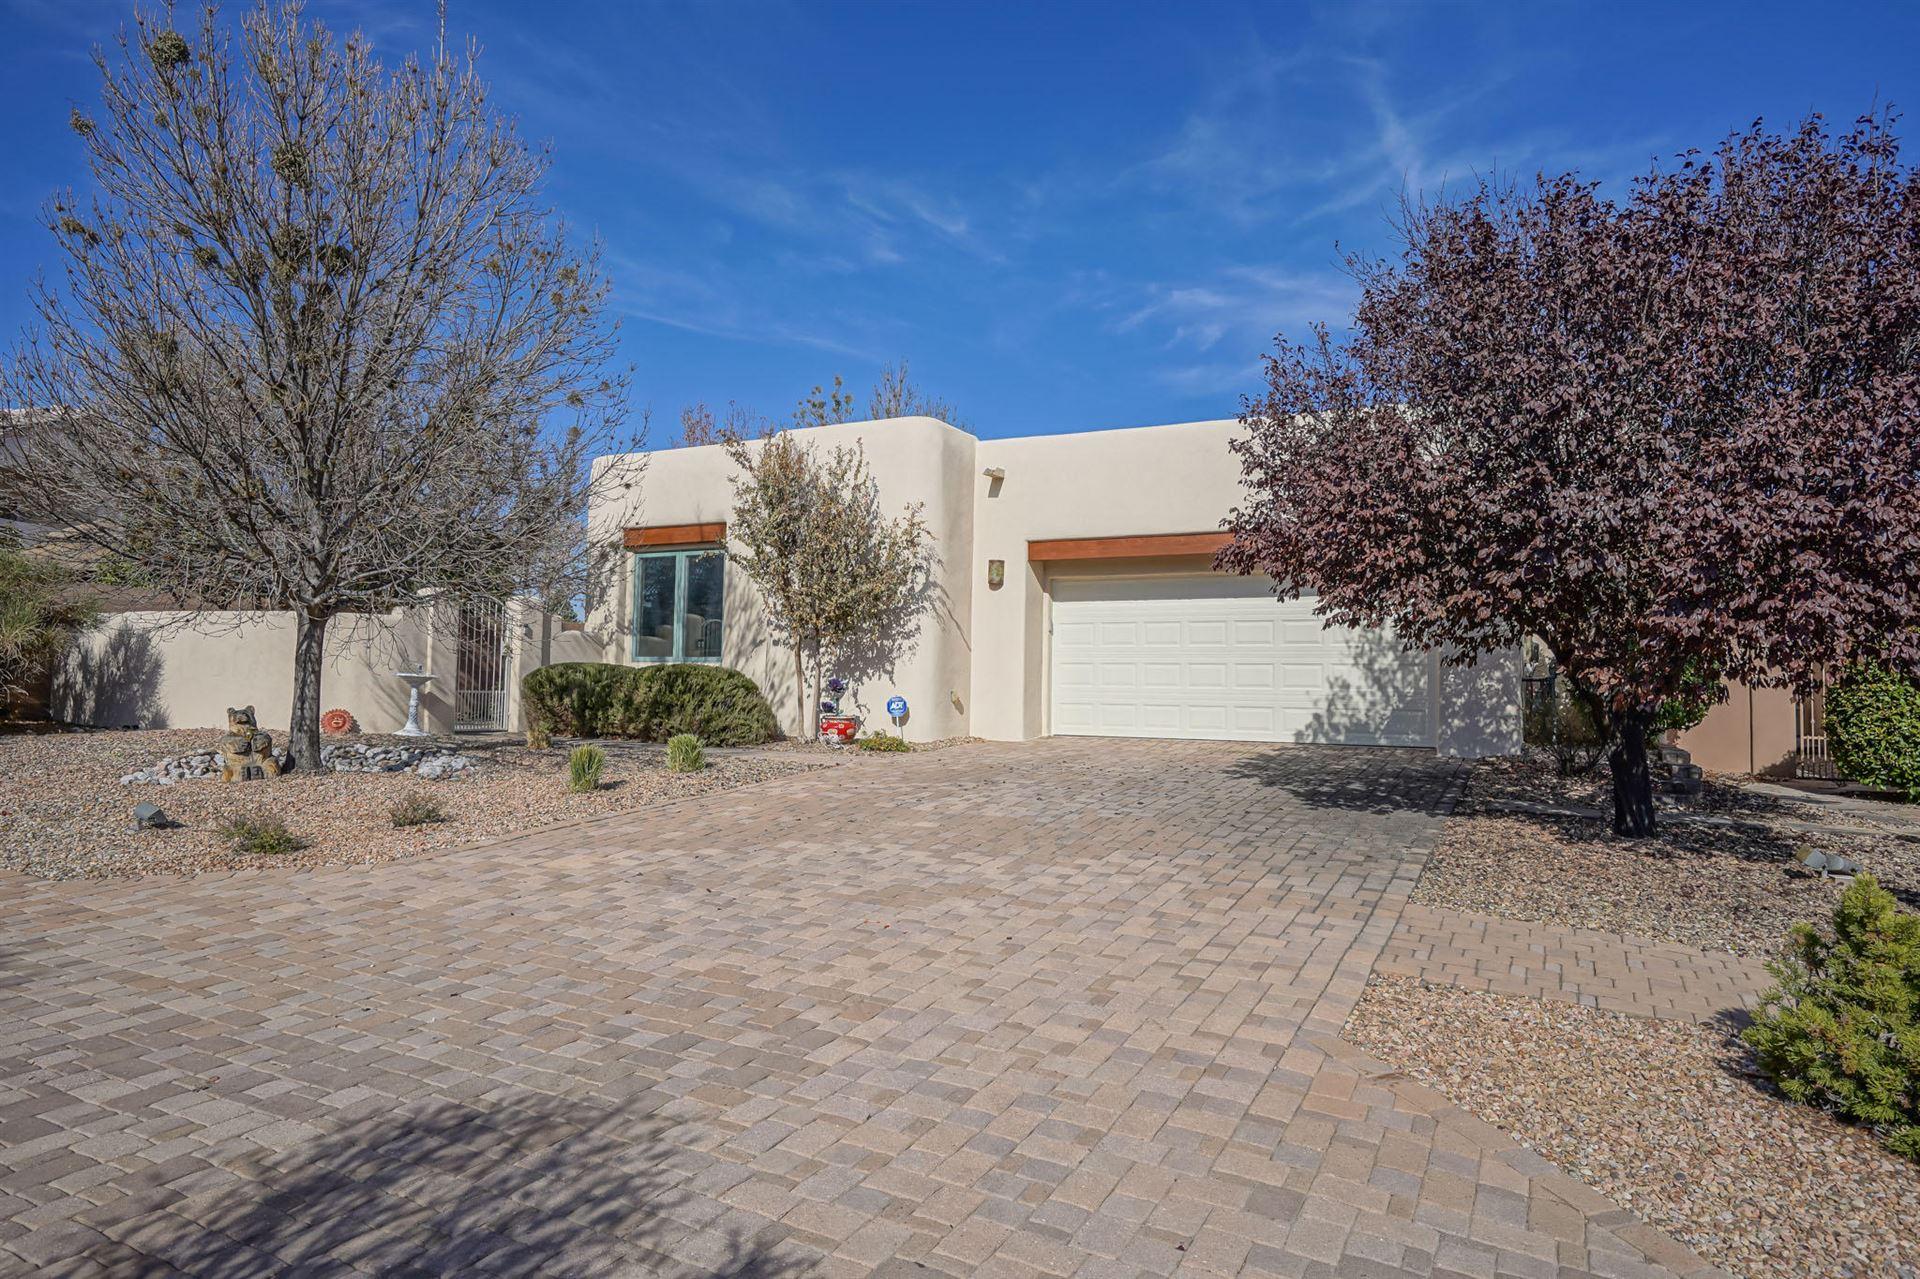 5940 MESA VISTA Trail NW, Albuquerque, NM 87120 - #: 981332